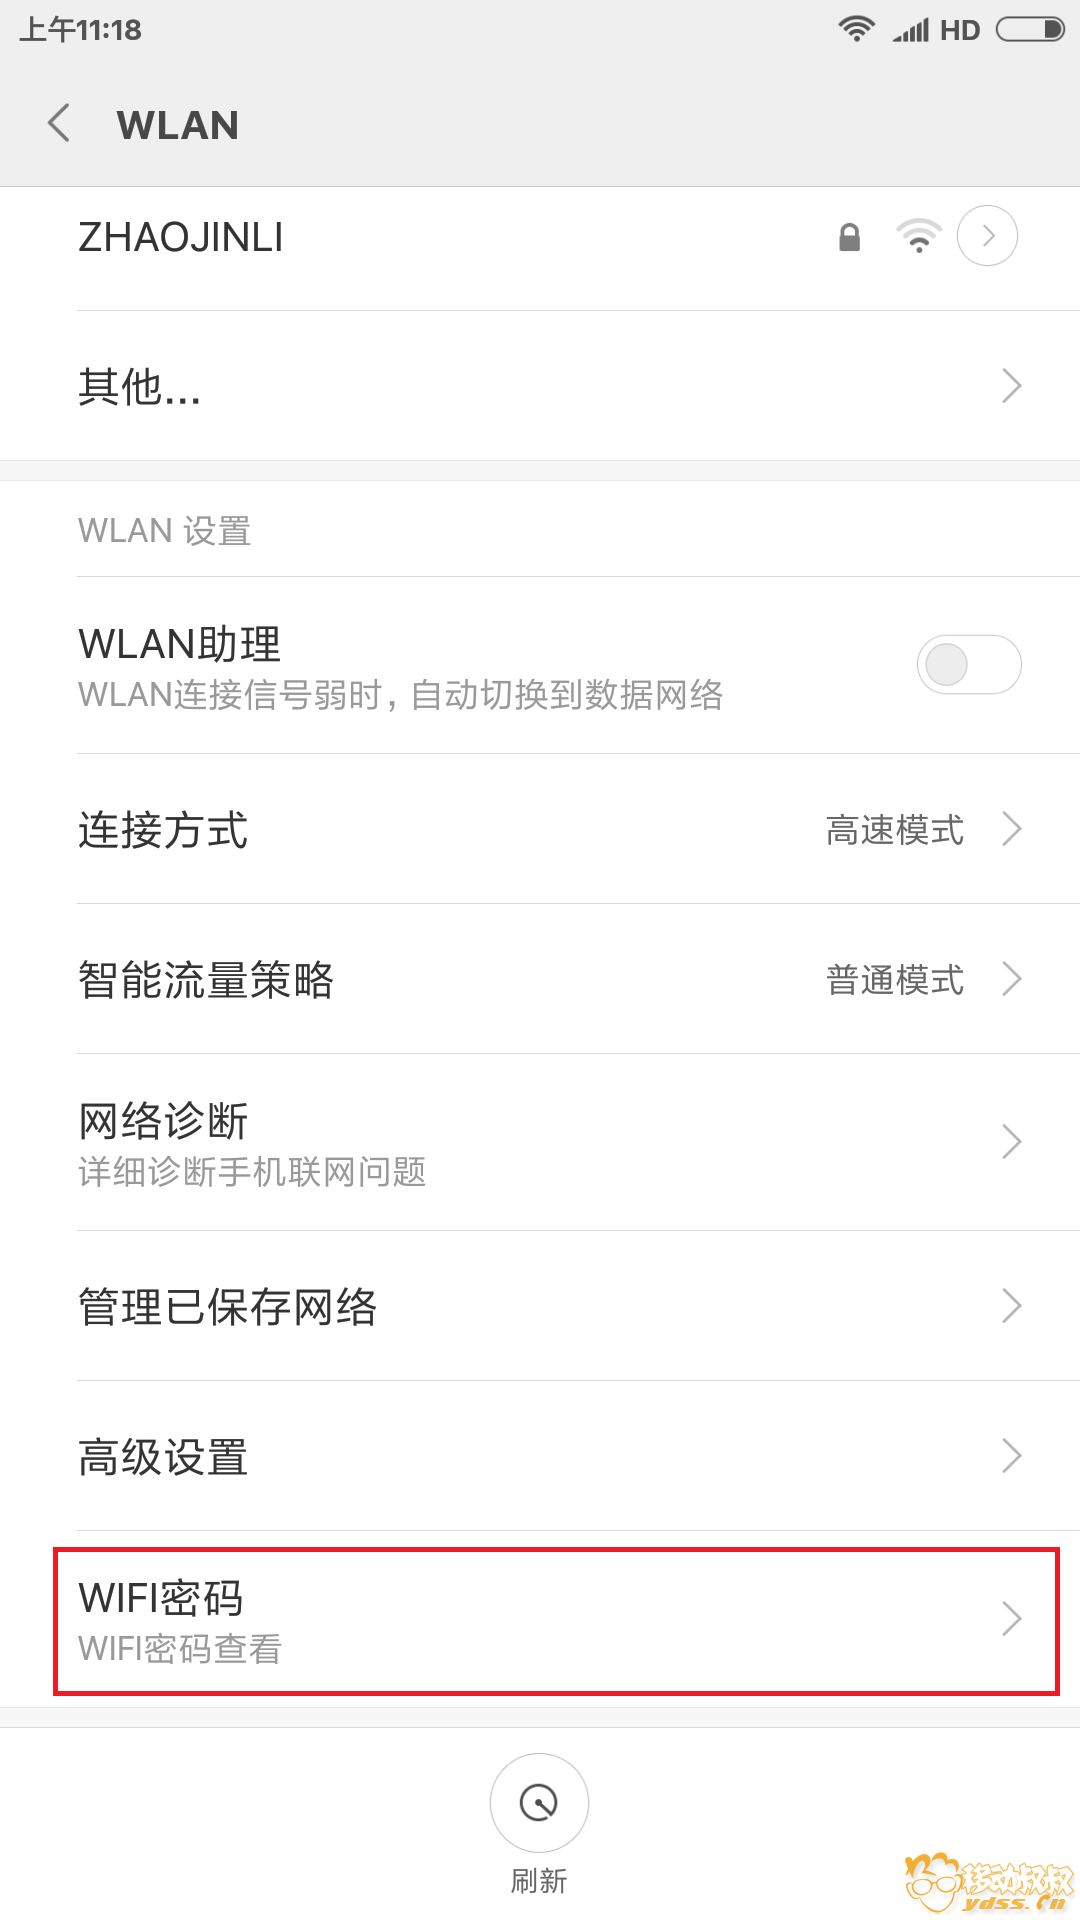 Screenshot_2018-05-04-11-18-21-305_com.android.settings.png